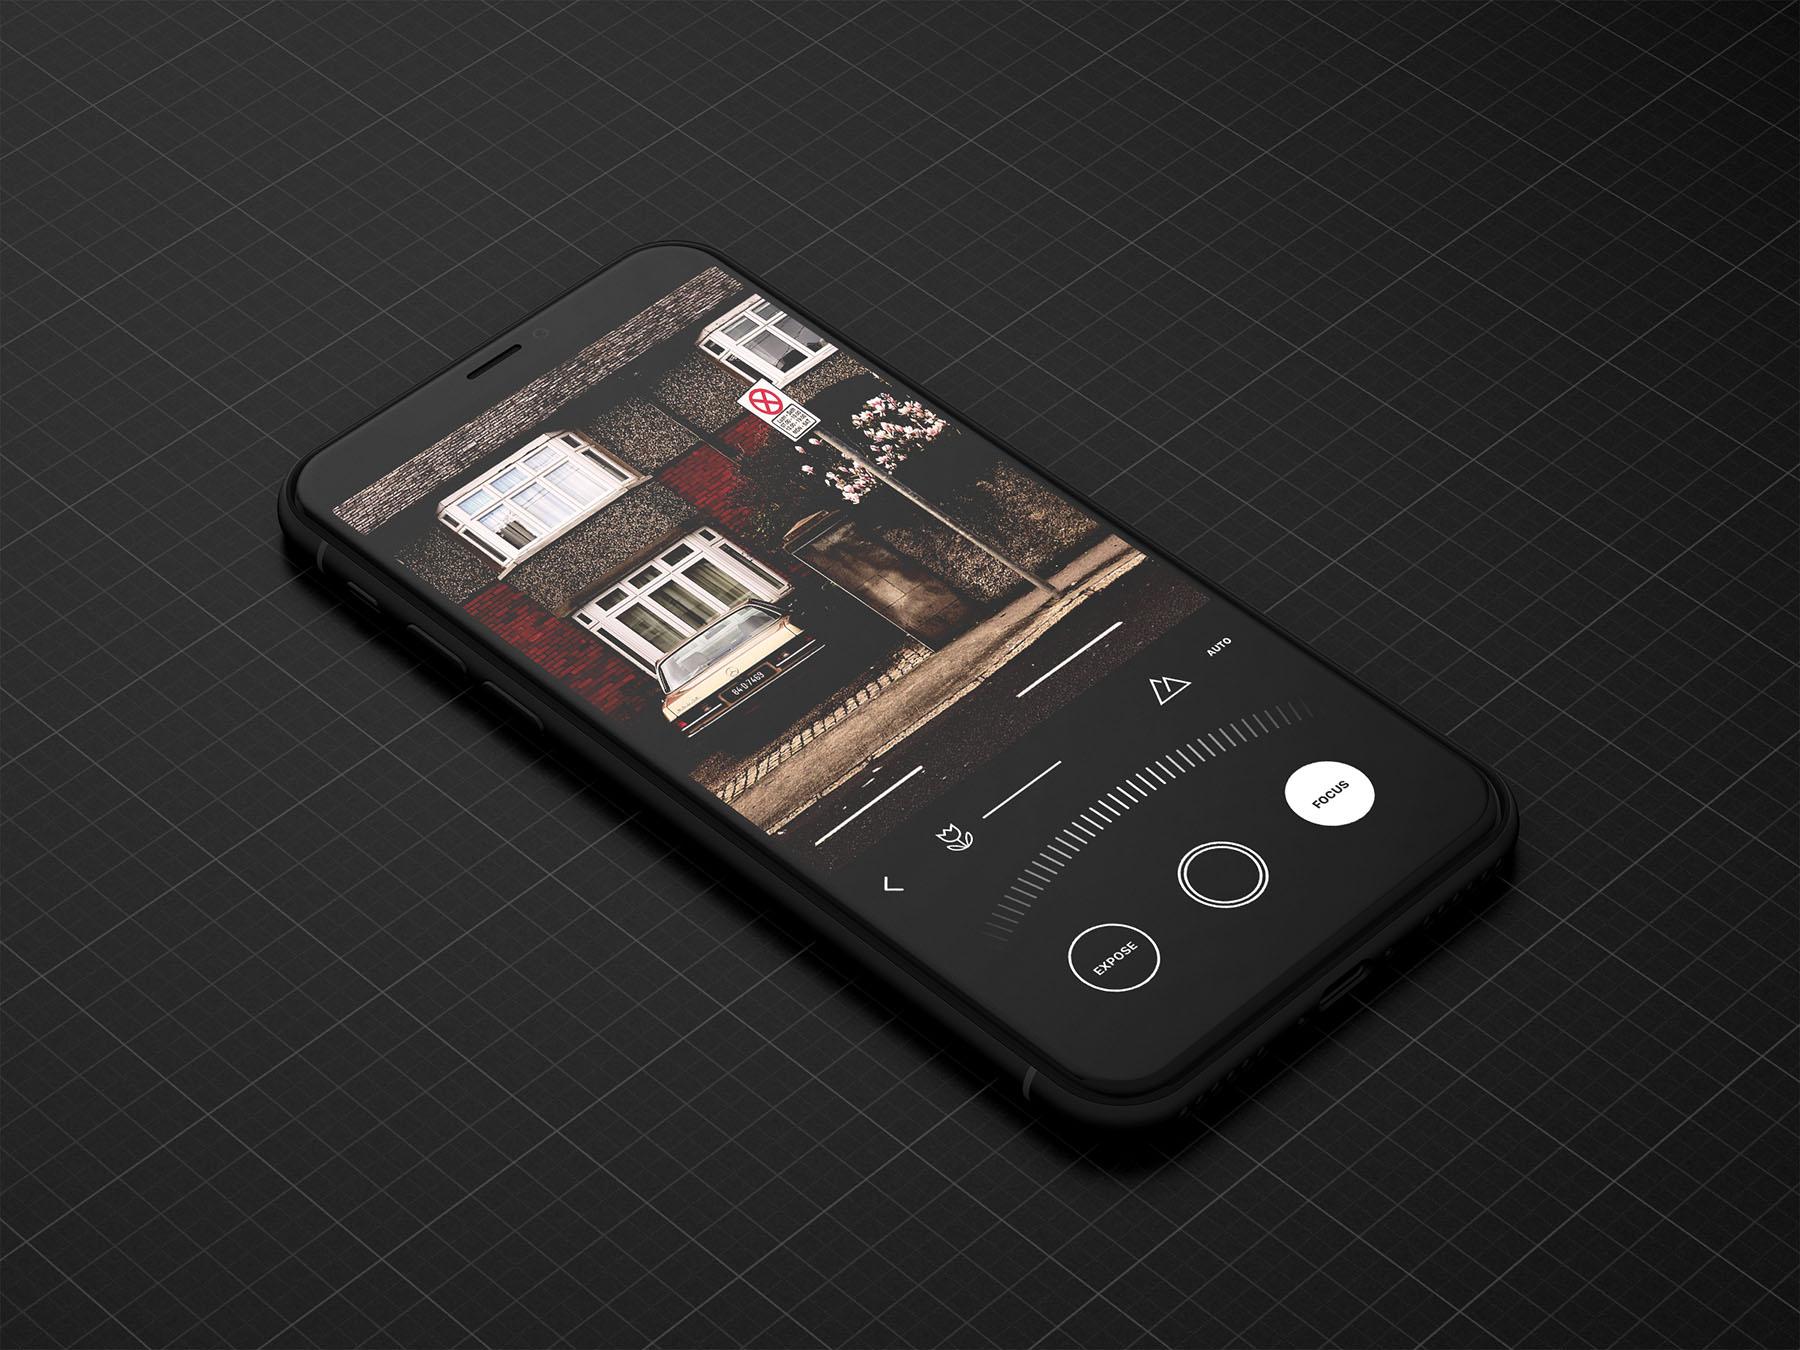 App Obscura 2